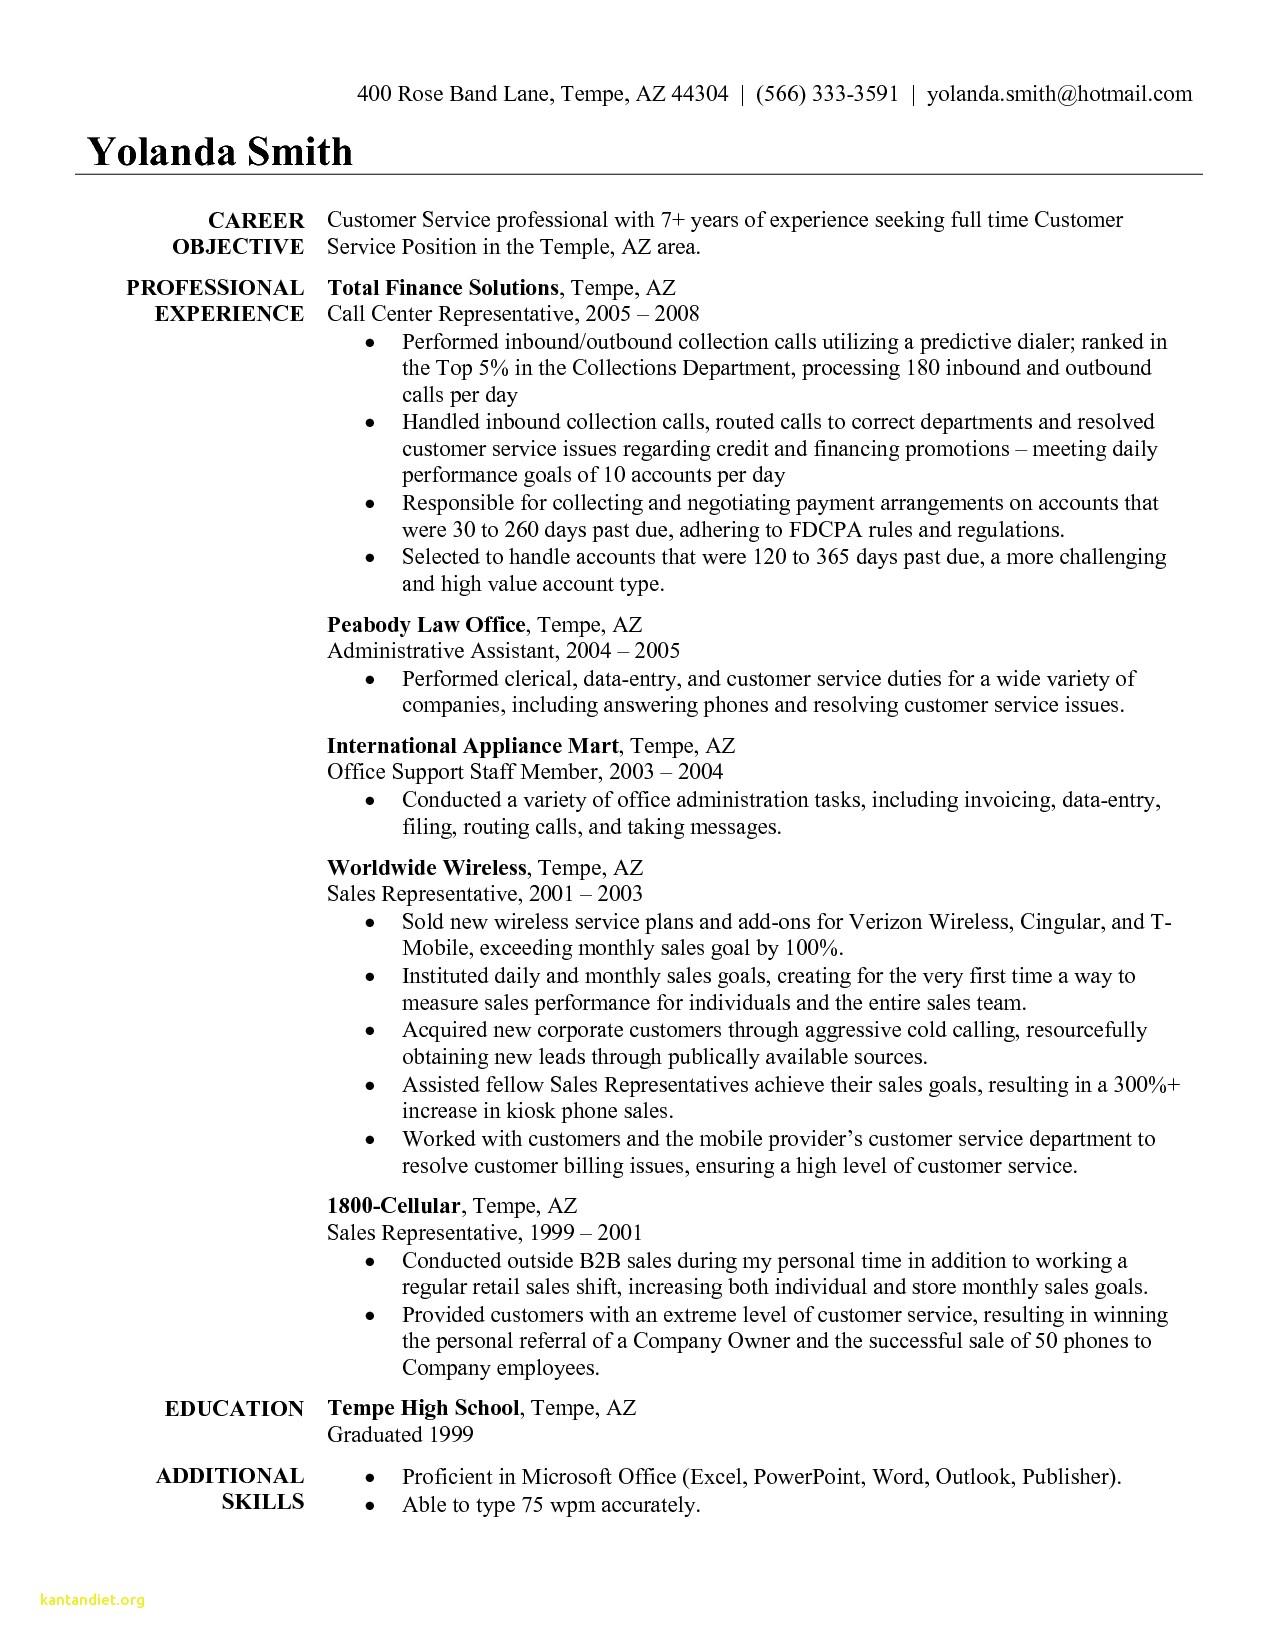 Livecareer Free Resume Templates